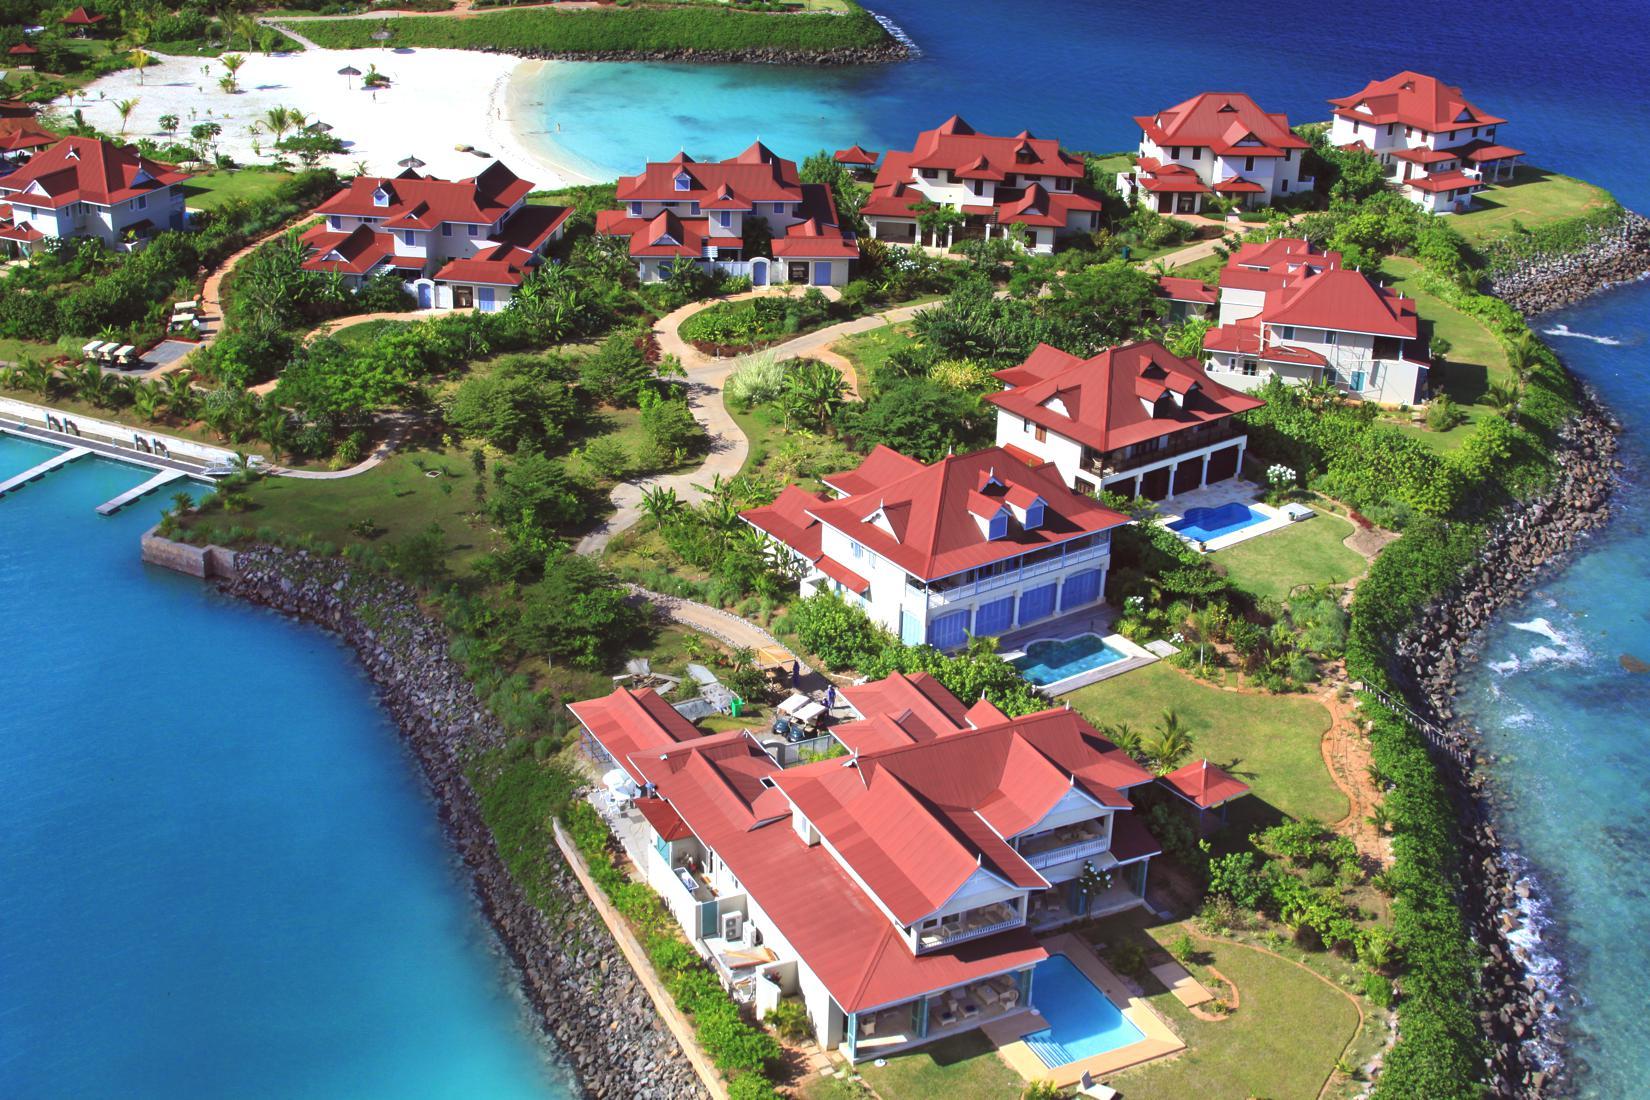 Gallery of luxurious villas in seychelles eden island properties - Eden island seychelles ...